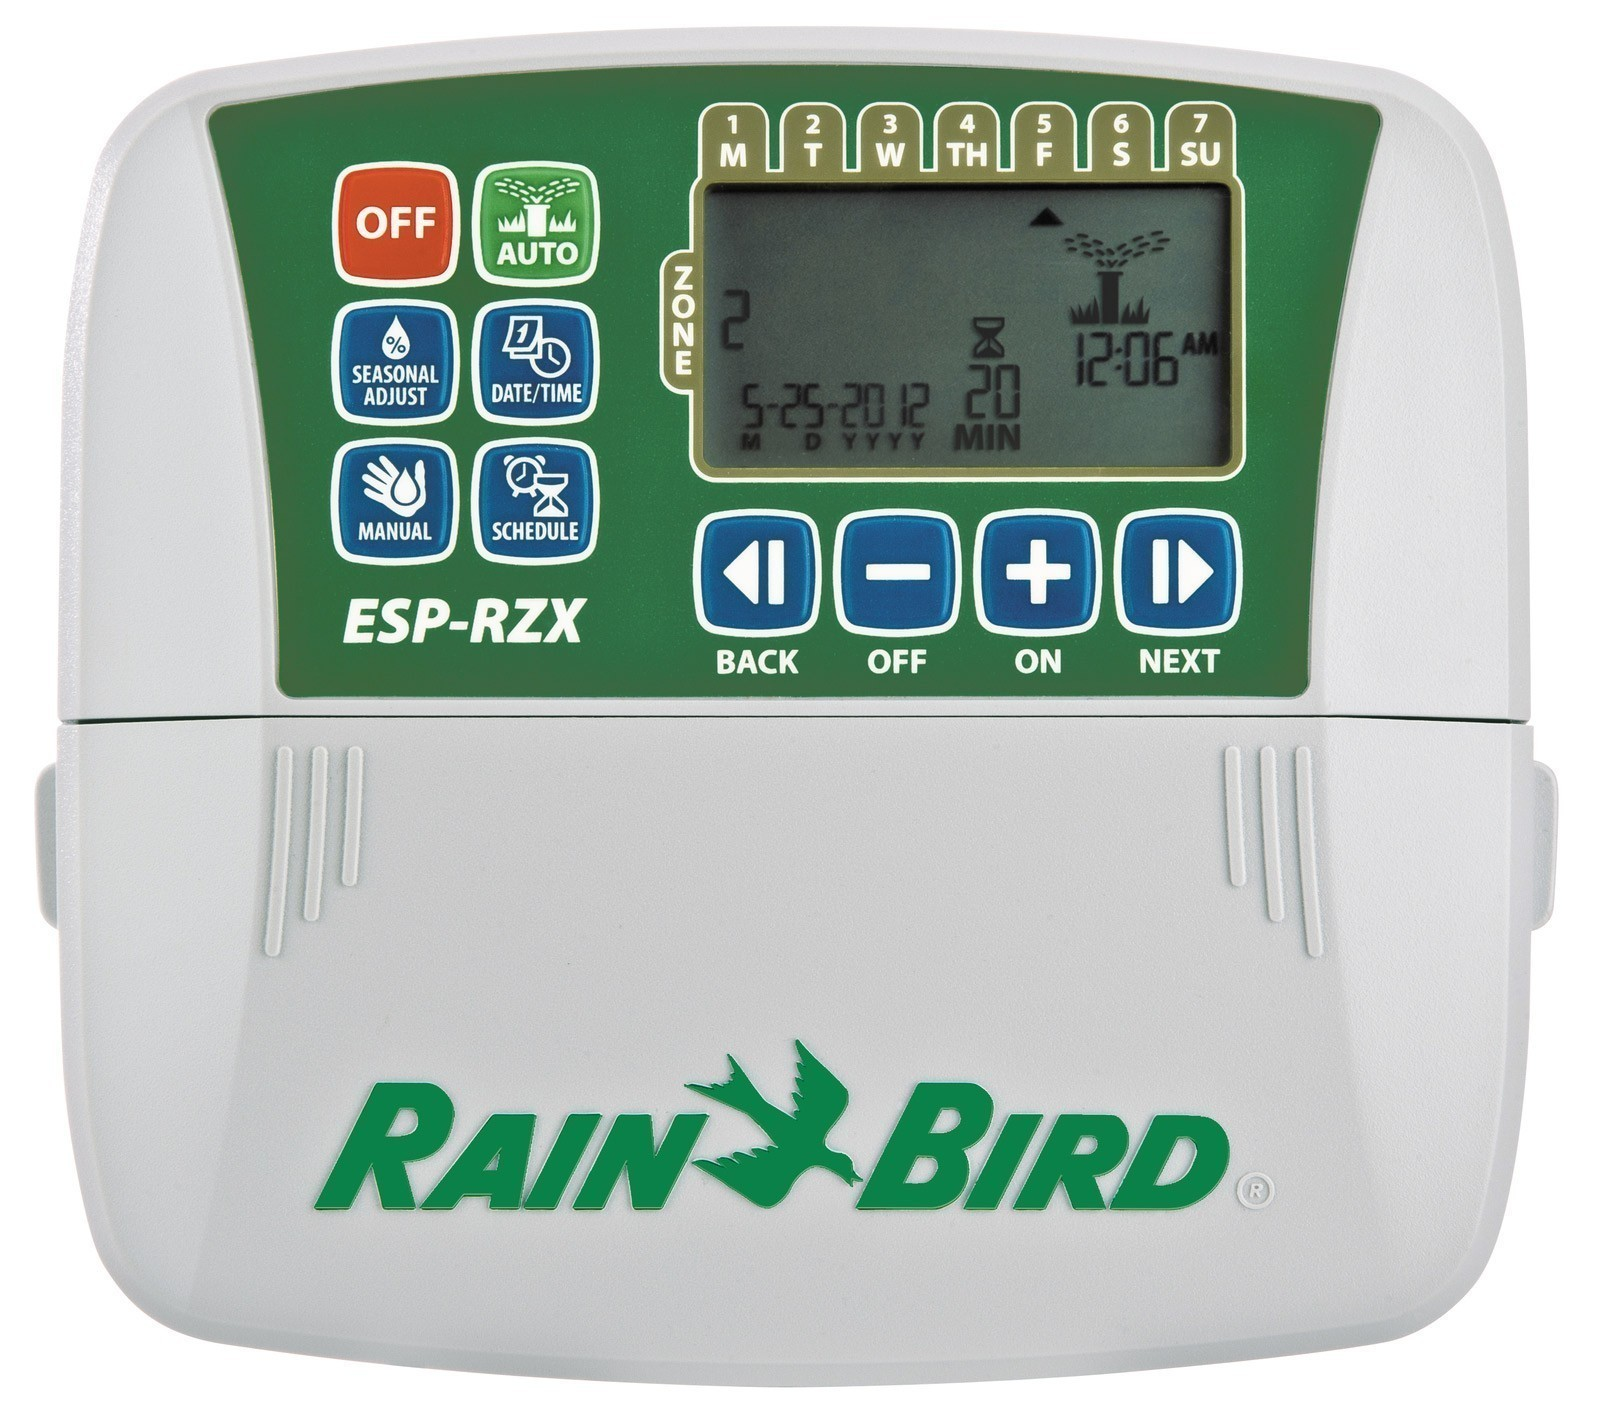 Rainbird Steuergerät ESP-RZX4i 4 Stationen Innenmontage Bild 1